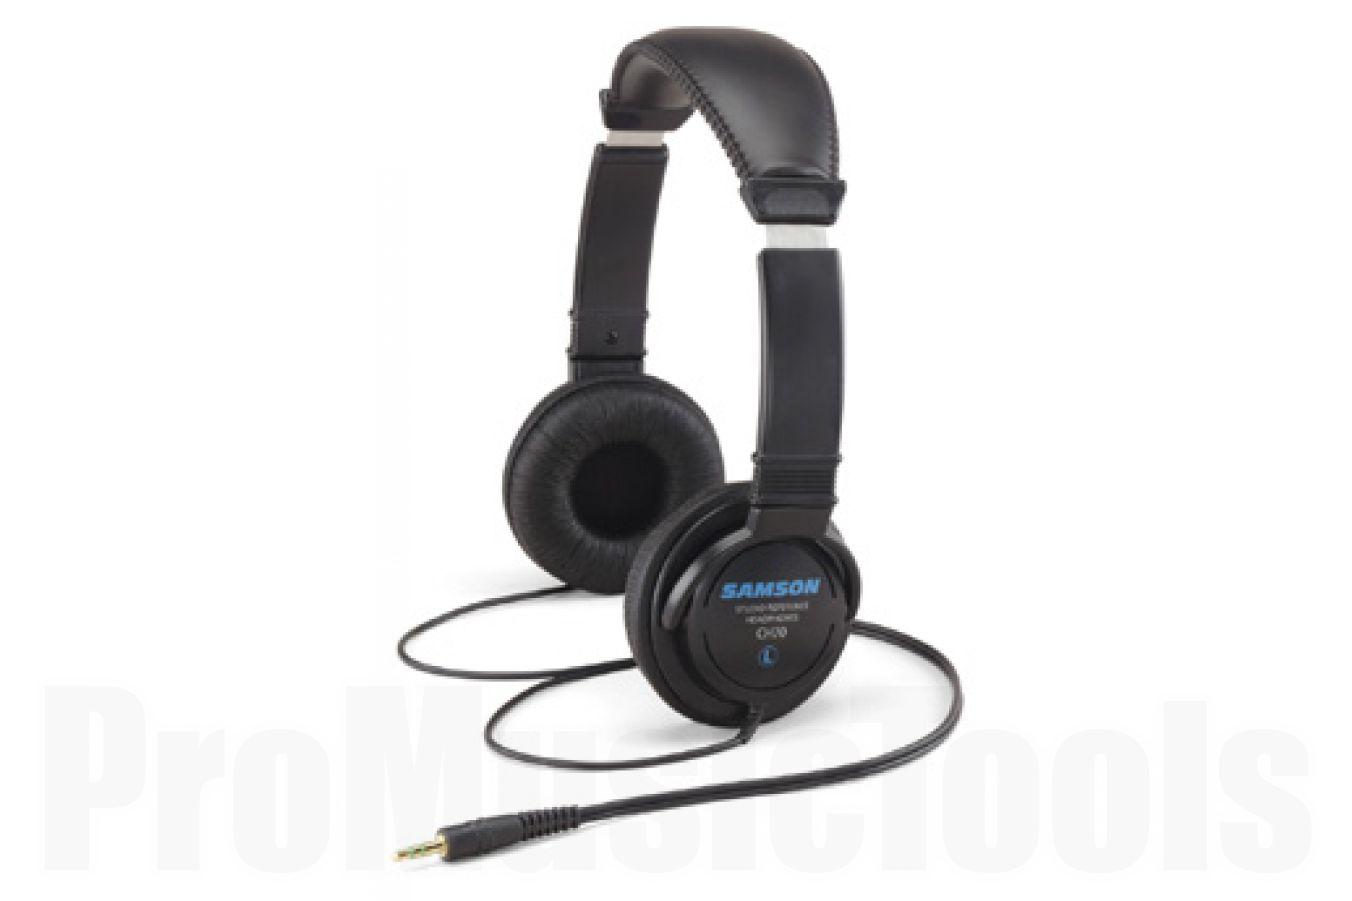 Samson CH70 Reference Headphones